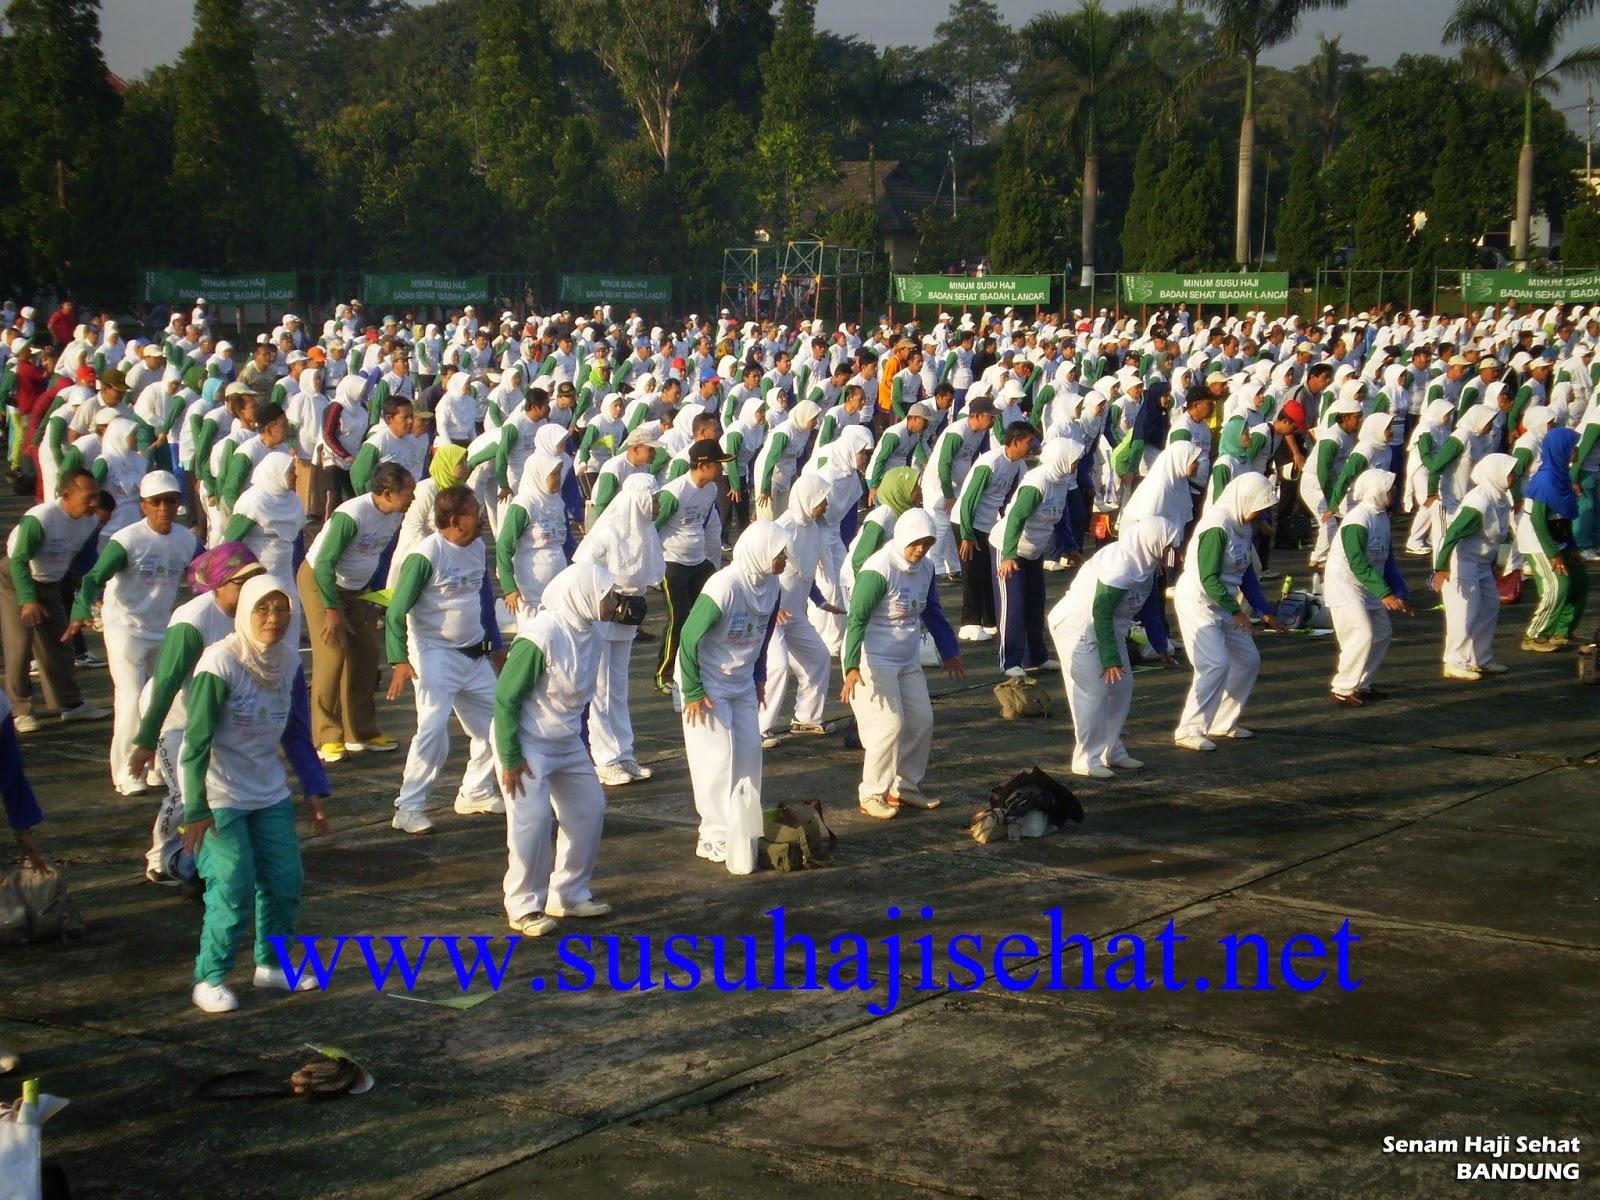 Senam Susu Haji Sehat Bandung